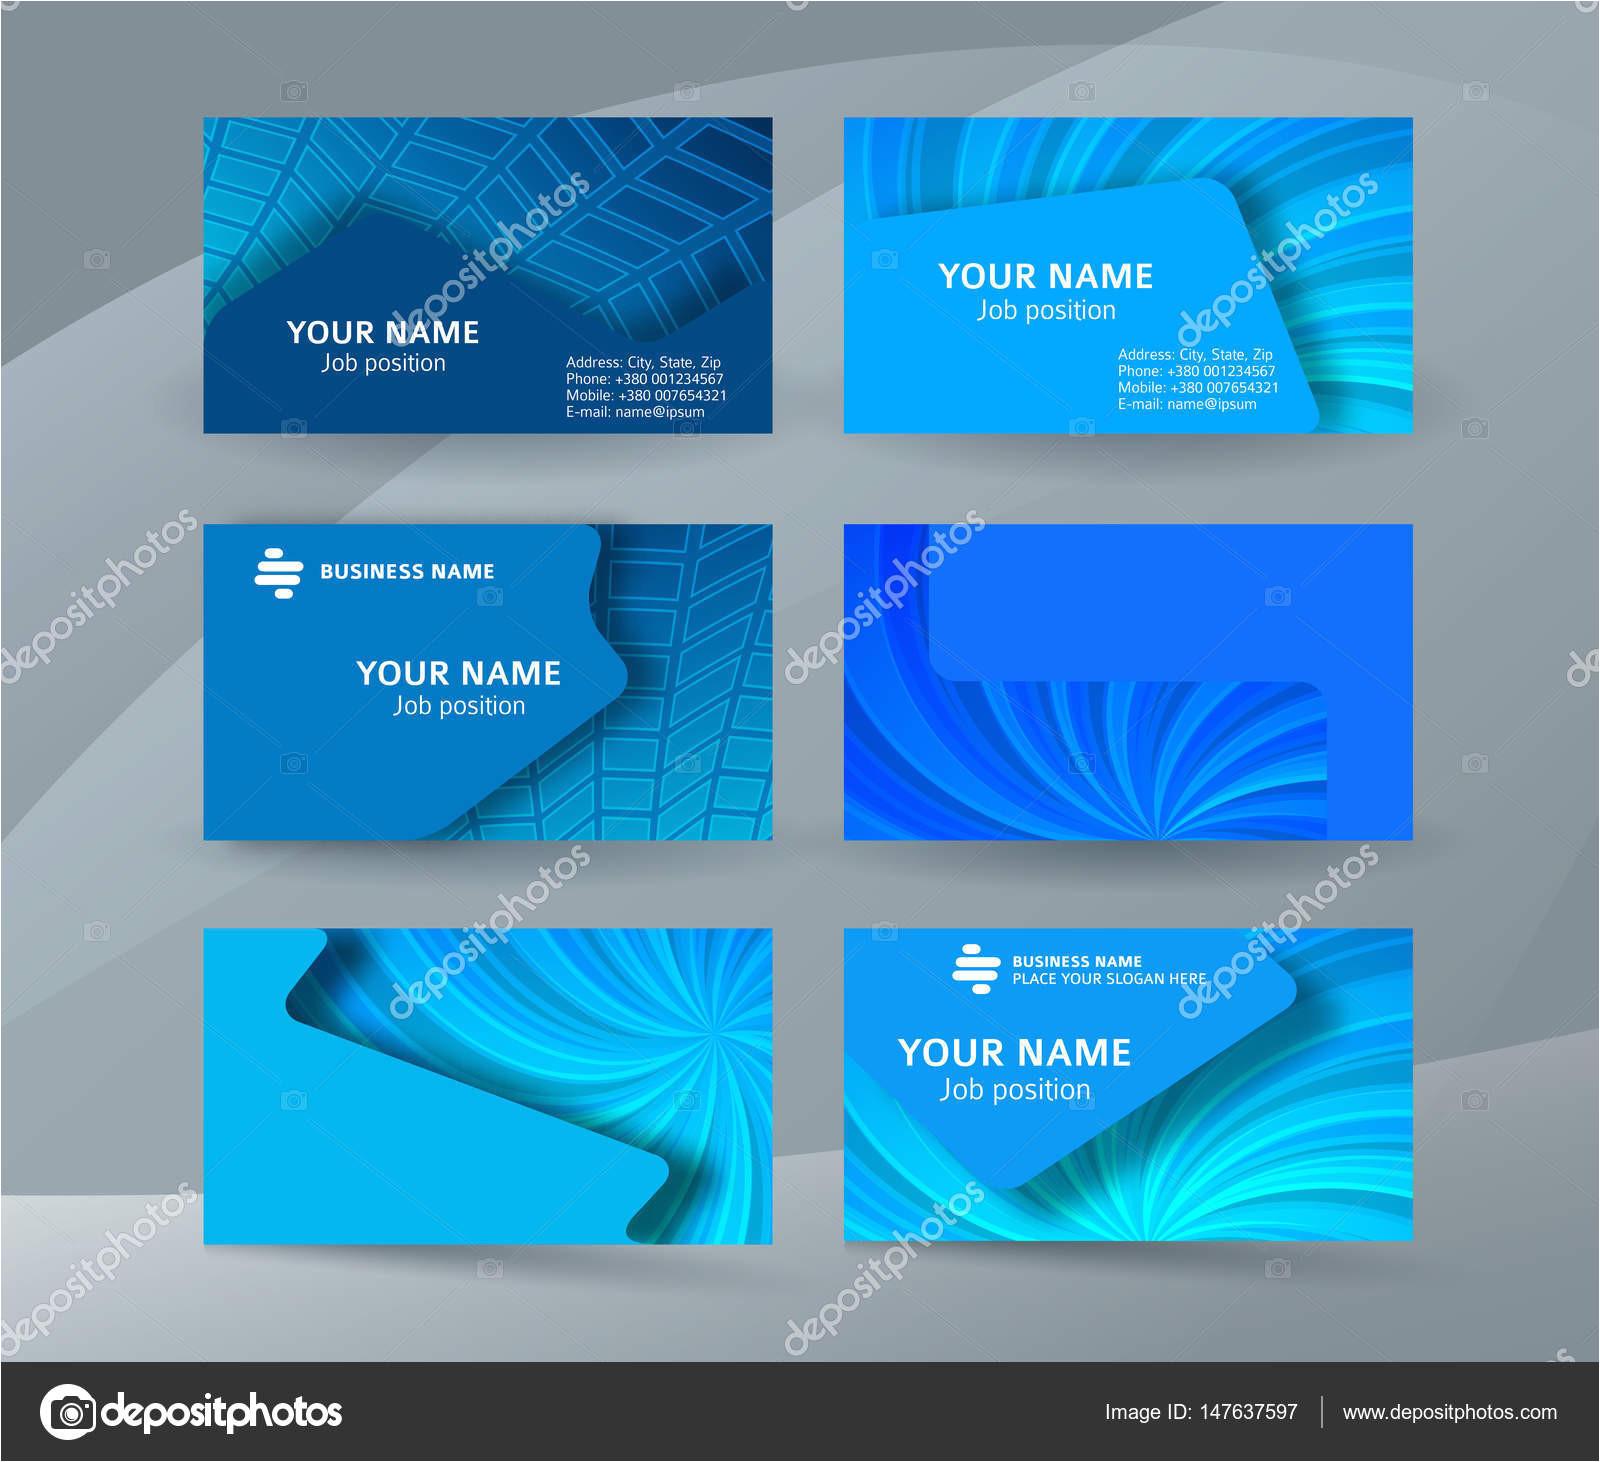 depositphotos 147637597 stock illustration business card background blue set jpg